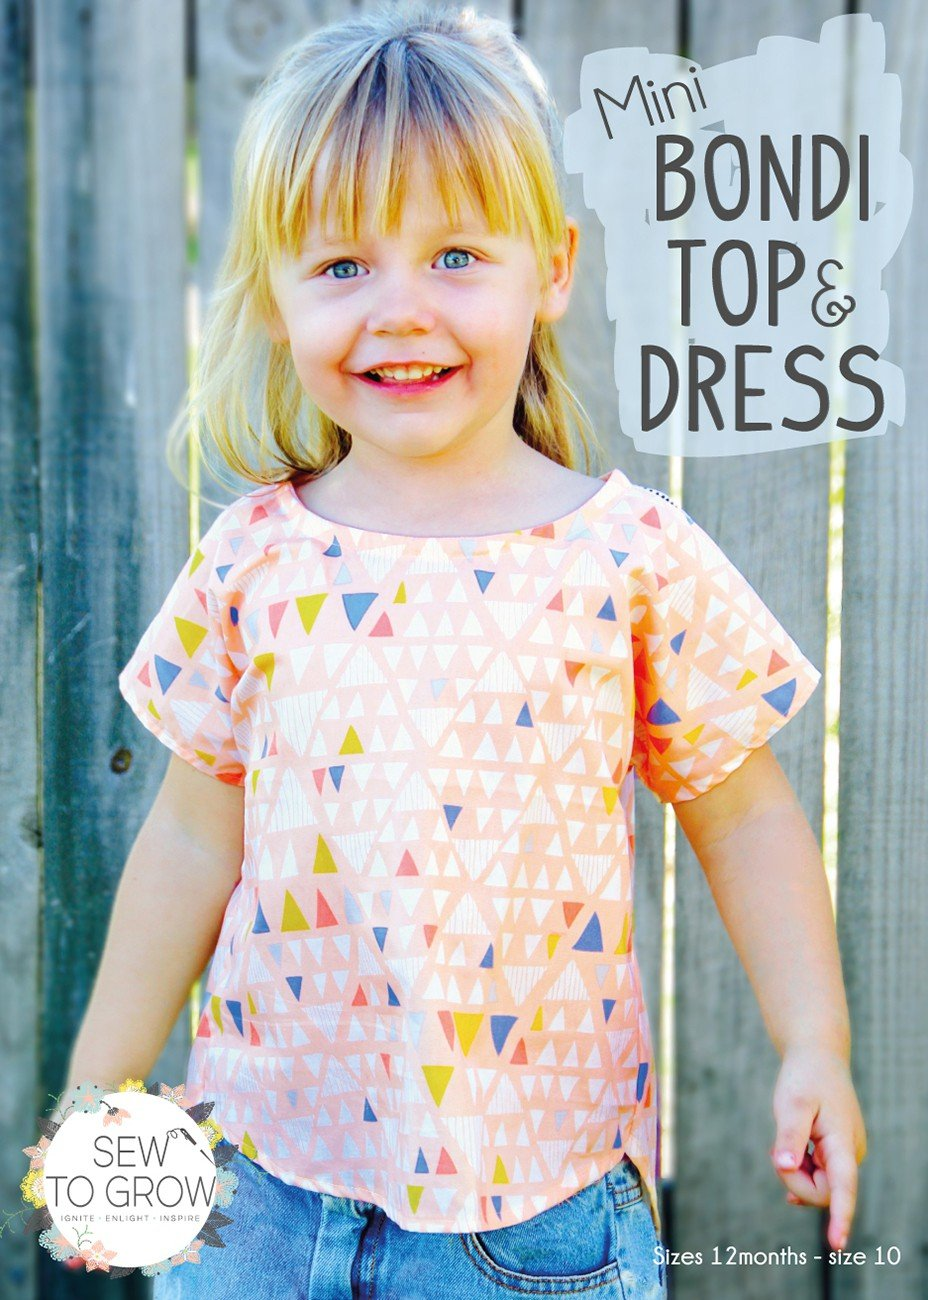 Mini Bondi Top and Dress